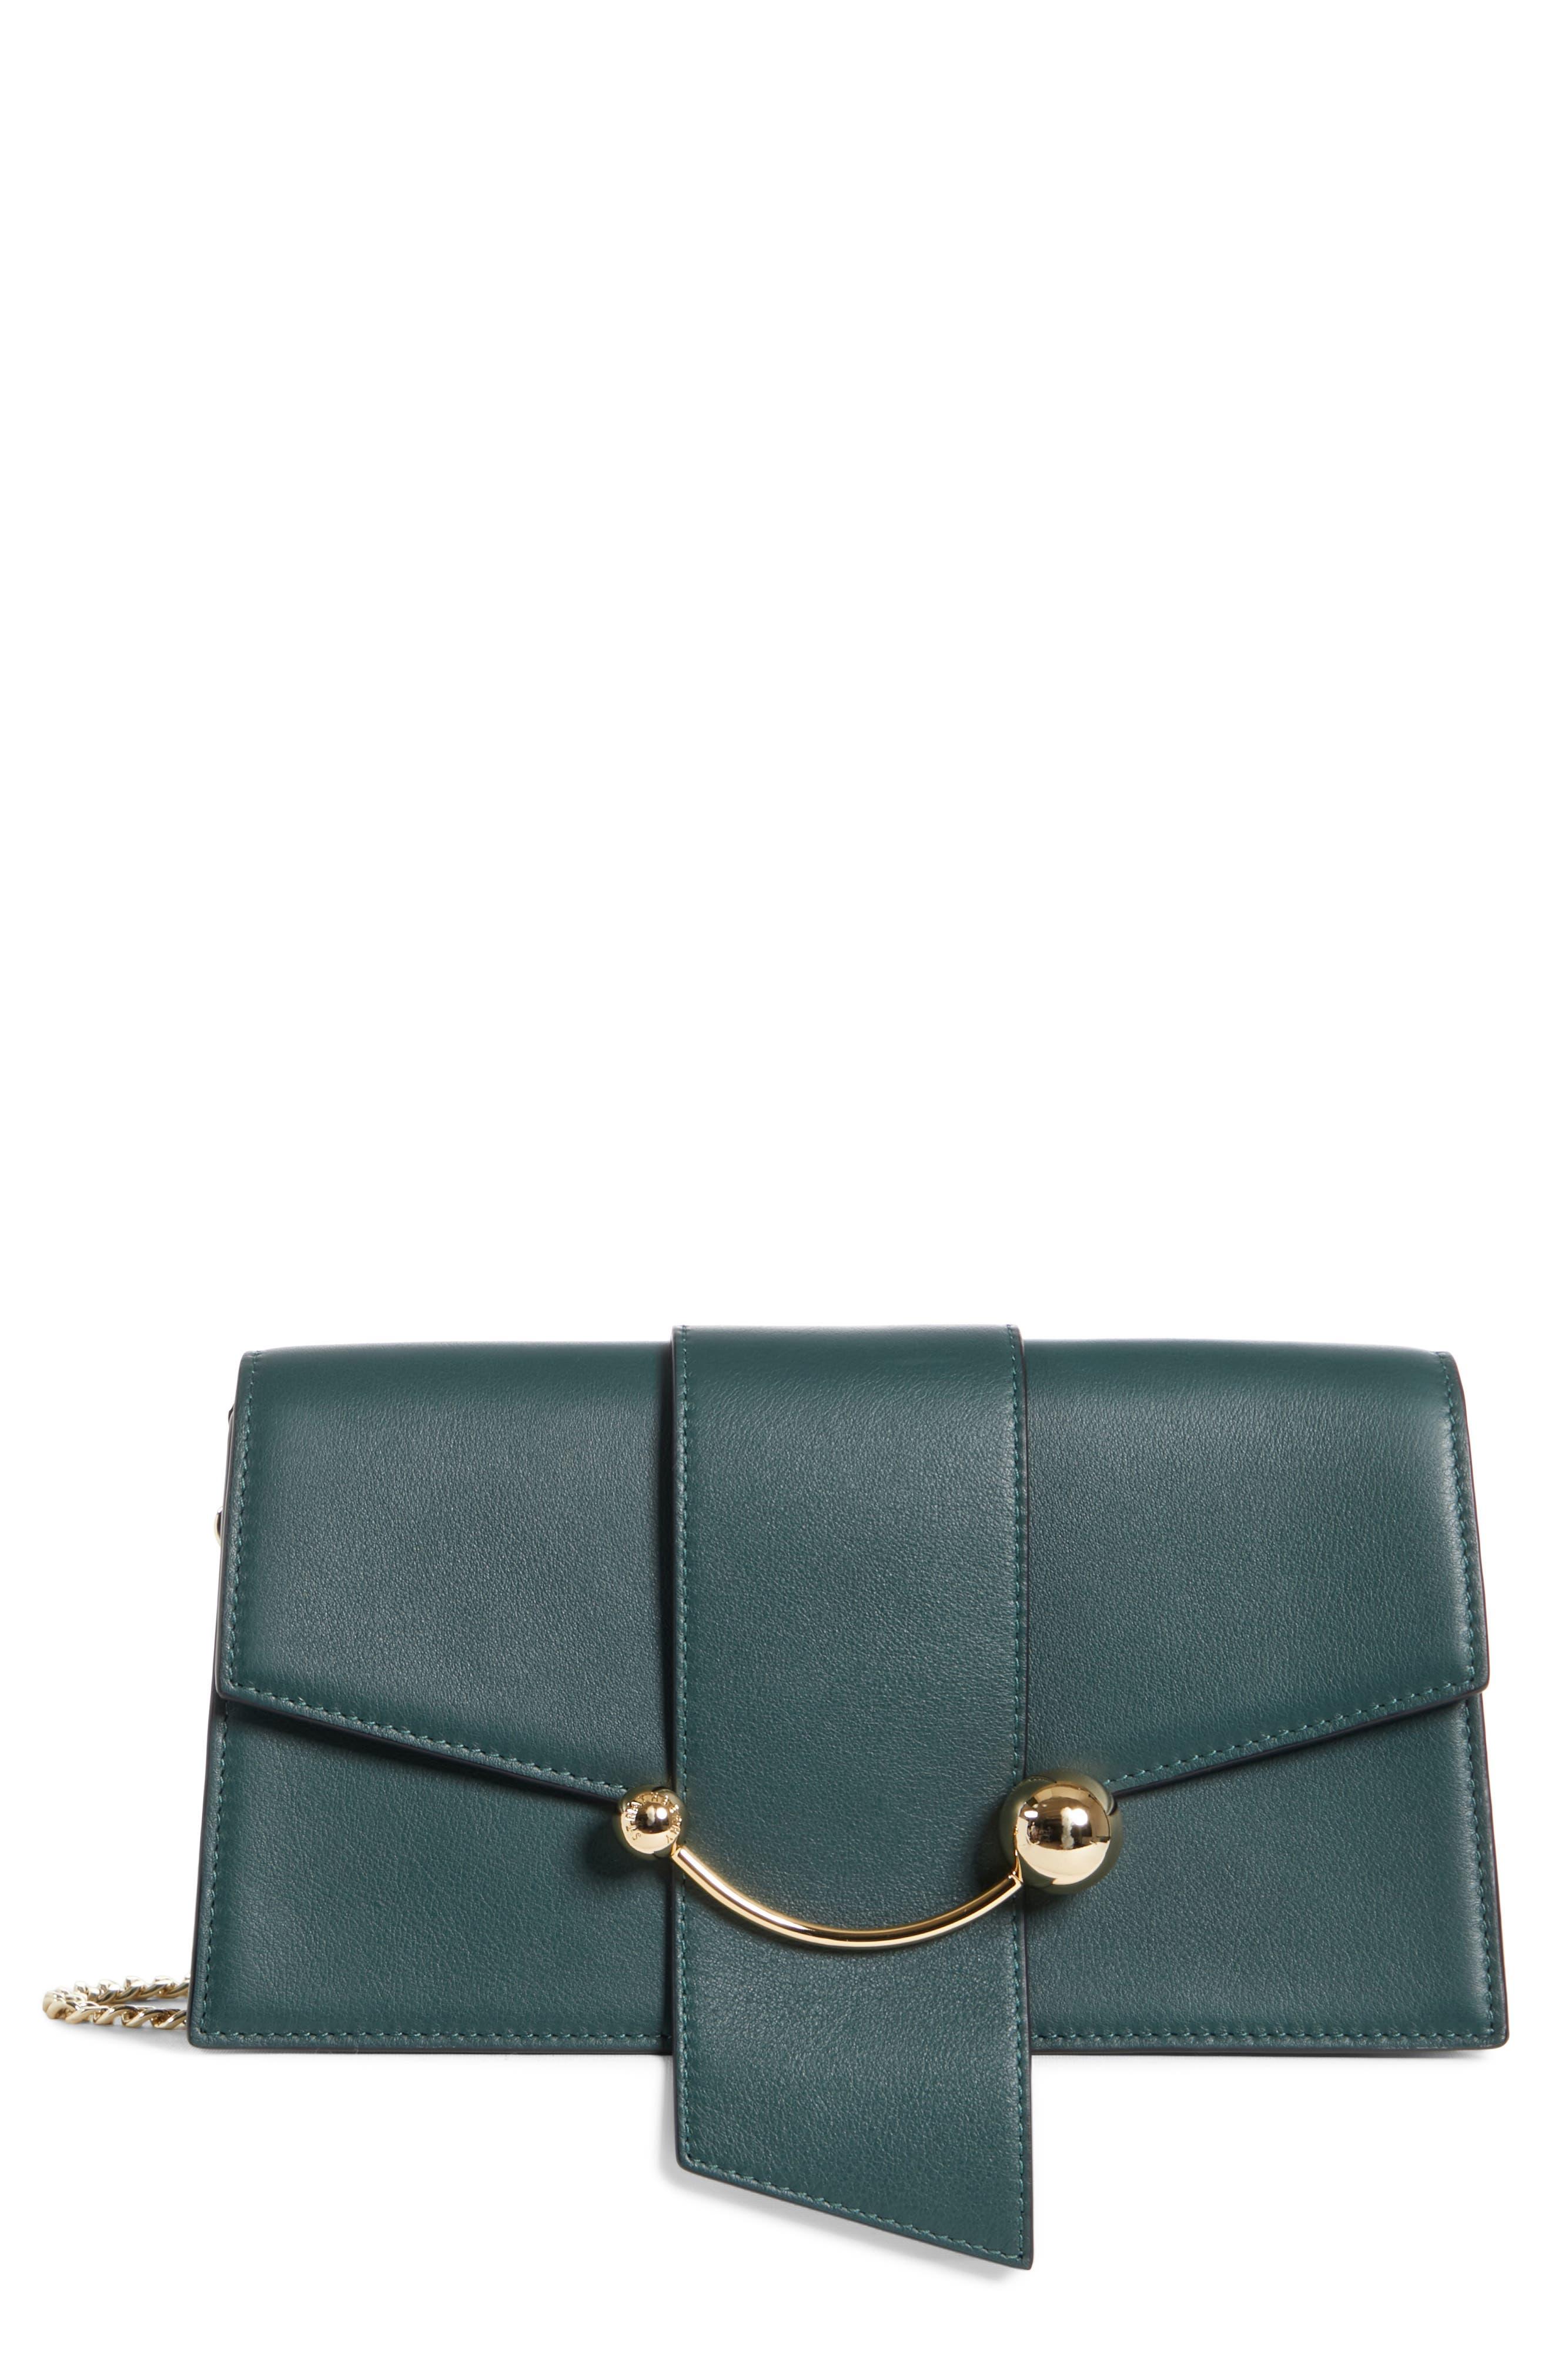 Mini Crescent Leather Clutch,                         Main,                         color, BOTTLE GREEN